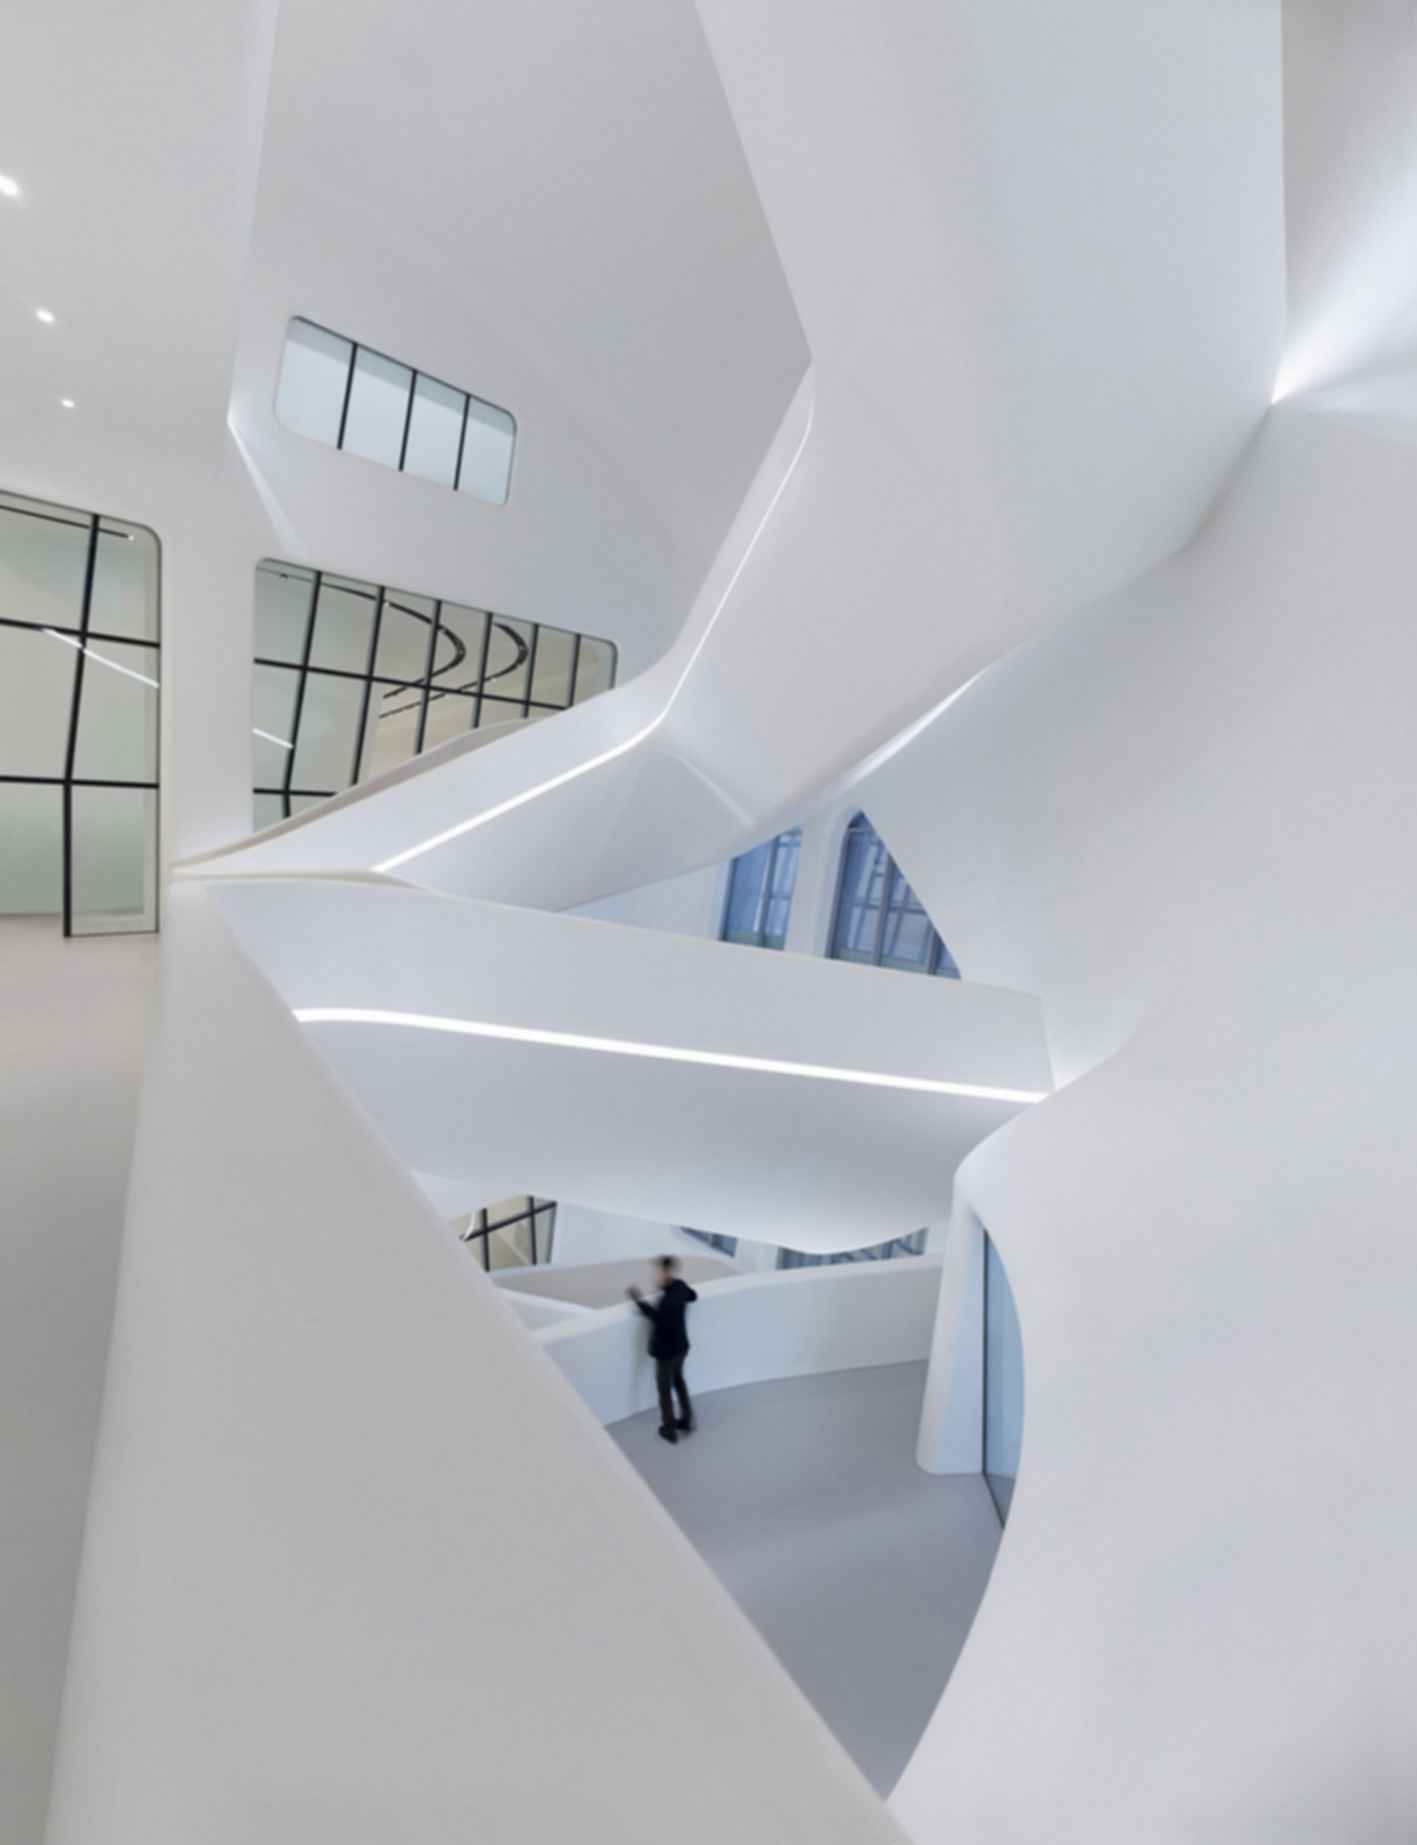 Dongdaemun Design Plaza - Concept Design/Interior